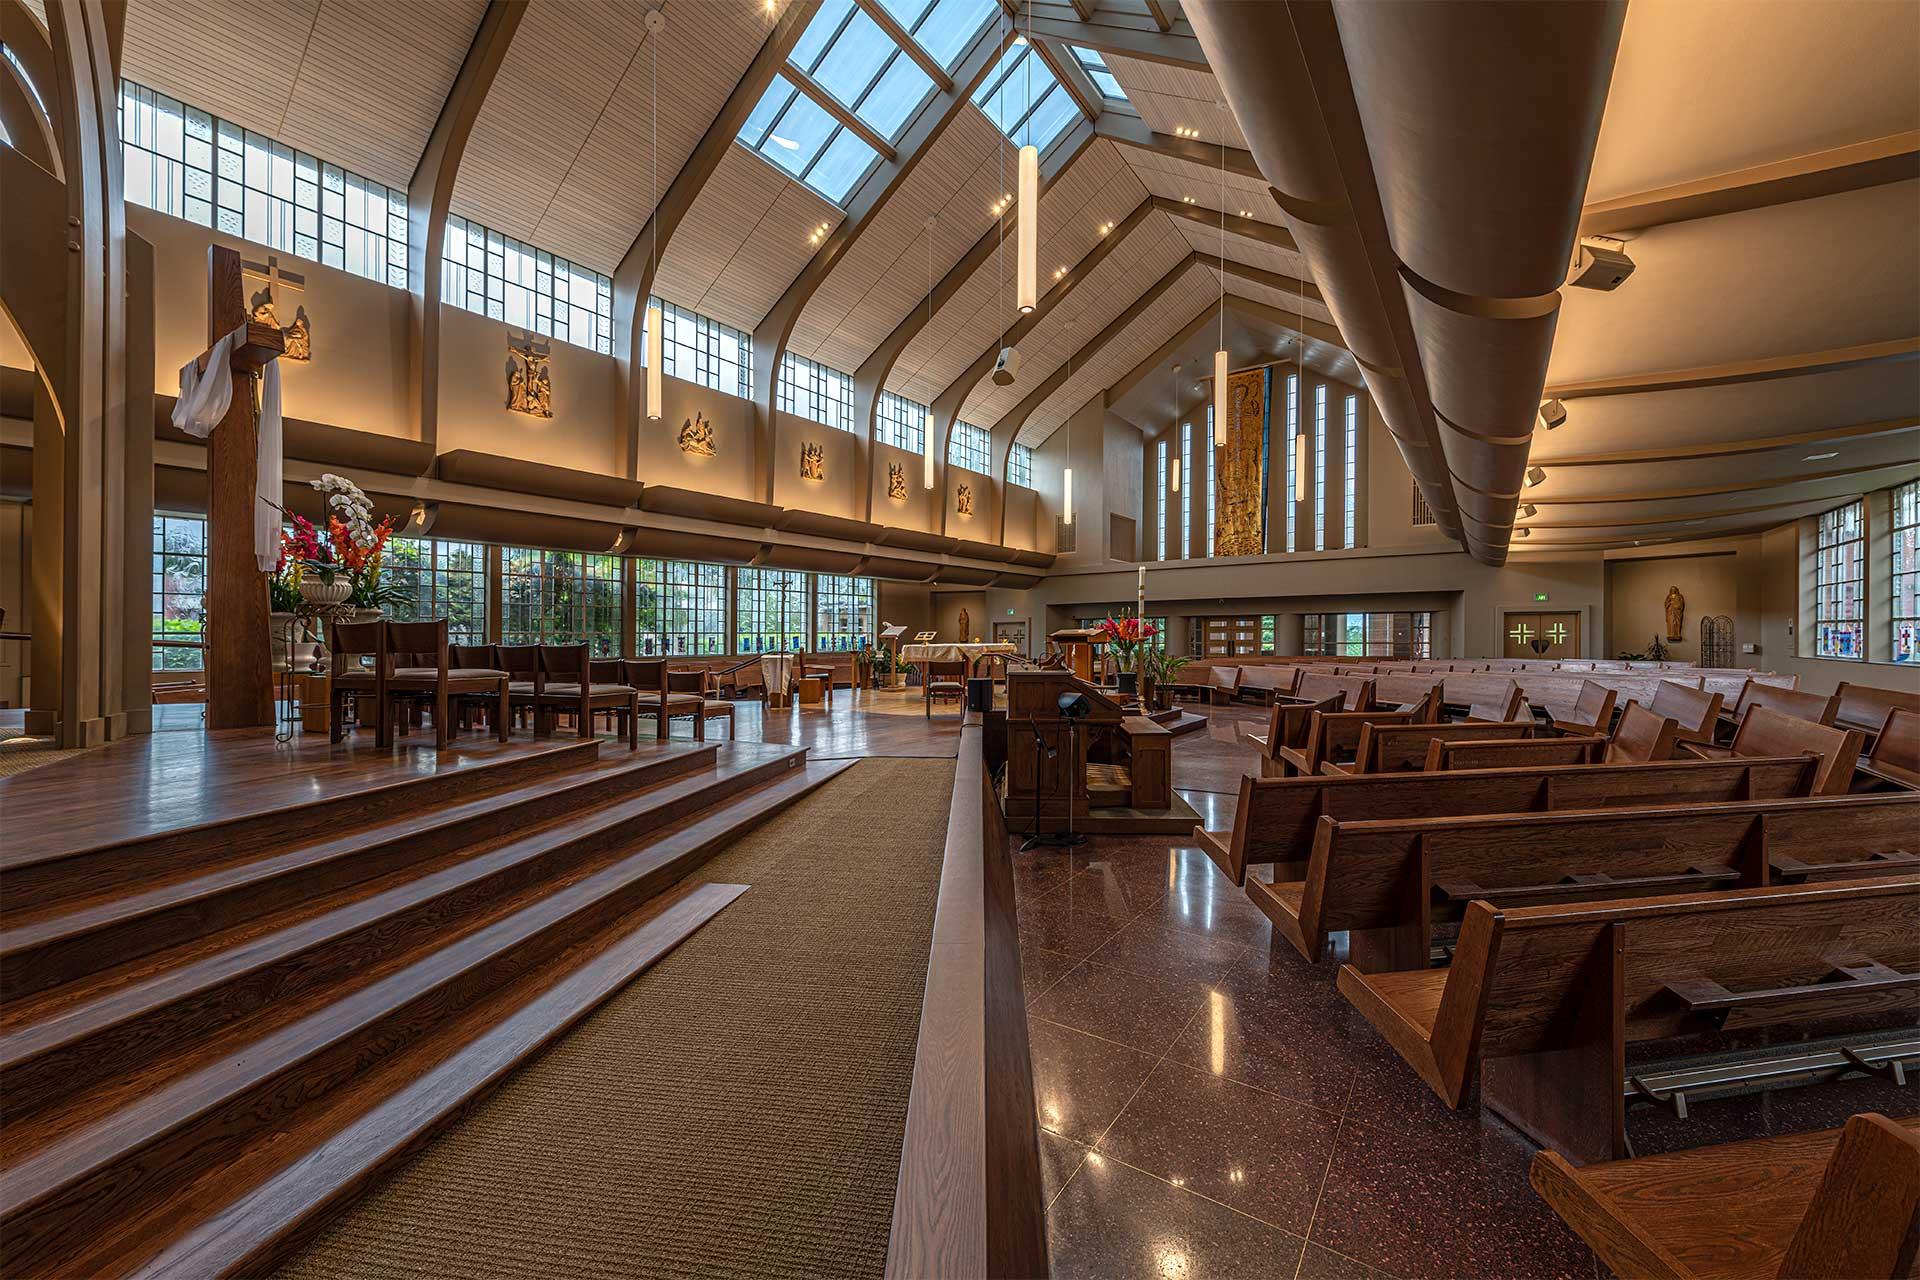 https://www.goudycc.com/wp-content/uploads/2020/12/sacred-heart-church-5.jpg